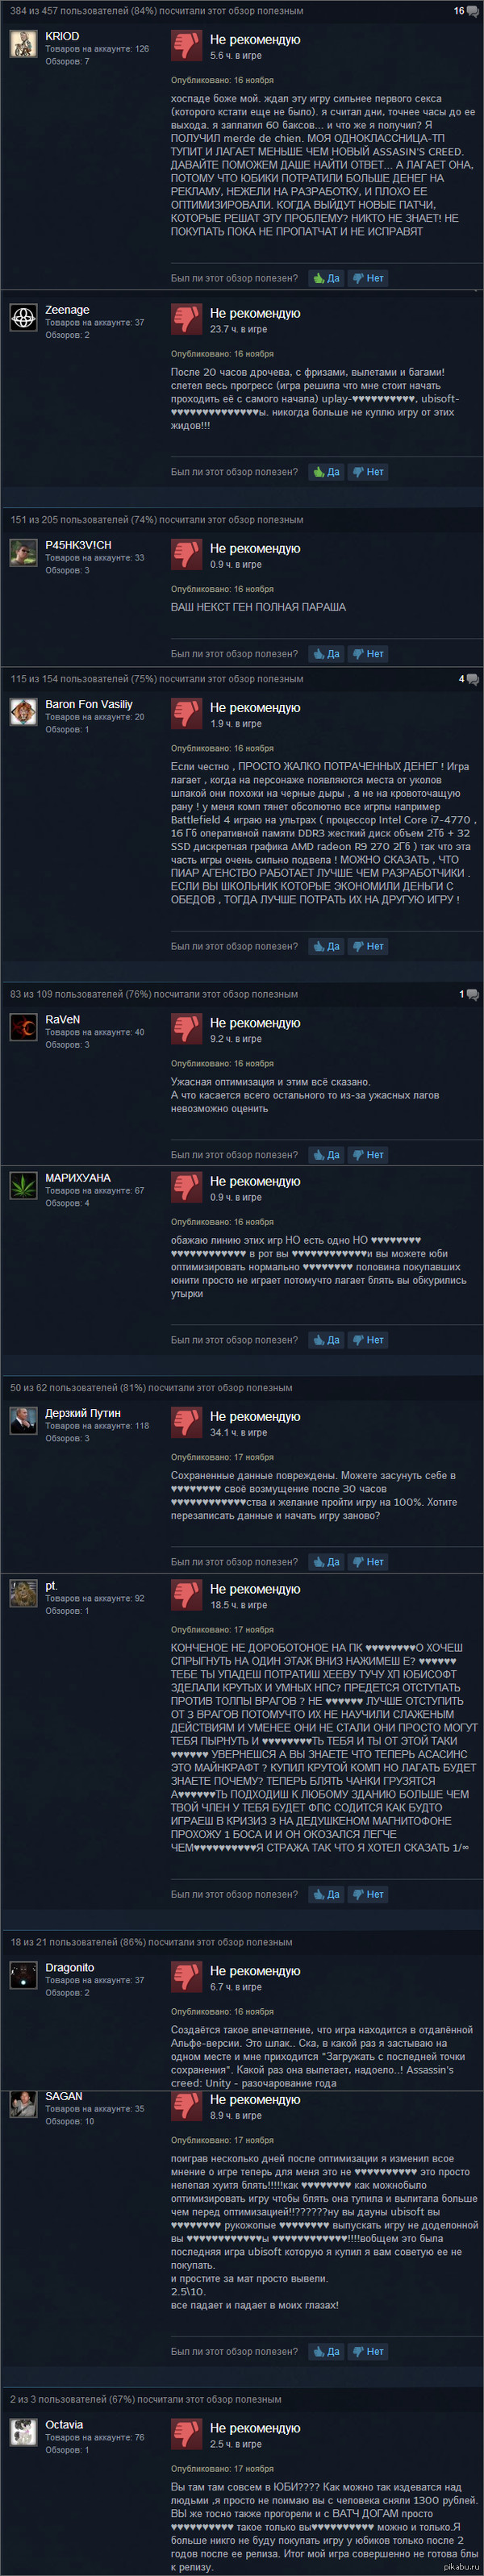 "За что так любят Assassin's Creed® Unity Задался вопросом почему игра стоит 6099р (<a href=""http://pikabu.ru/story/pokhozhe_nas_gdeto__2821087)."">http://pikabu.ru/story/_2821087</a> Цена явно завышена"